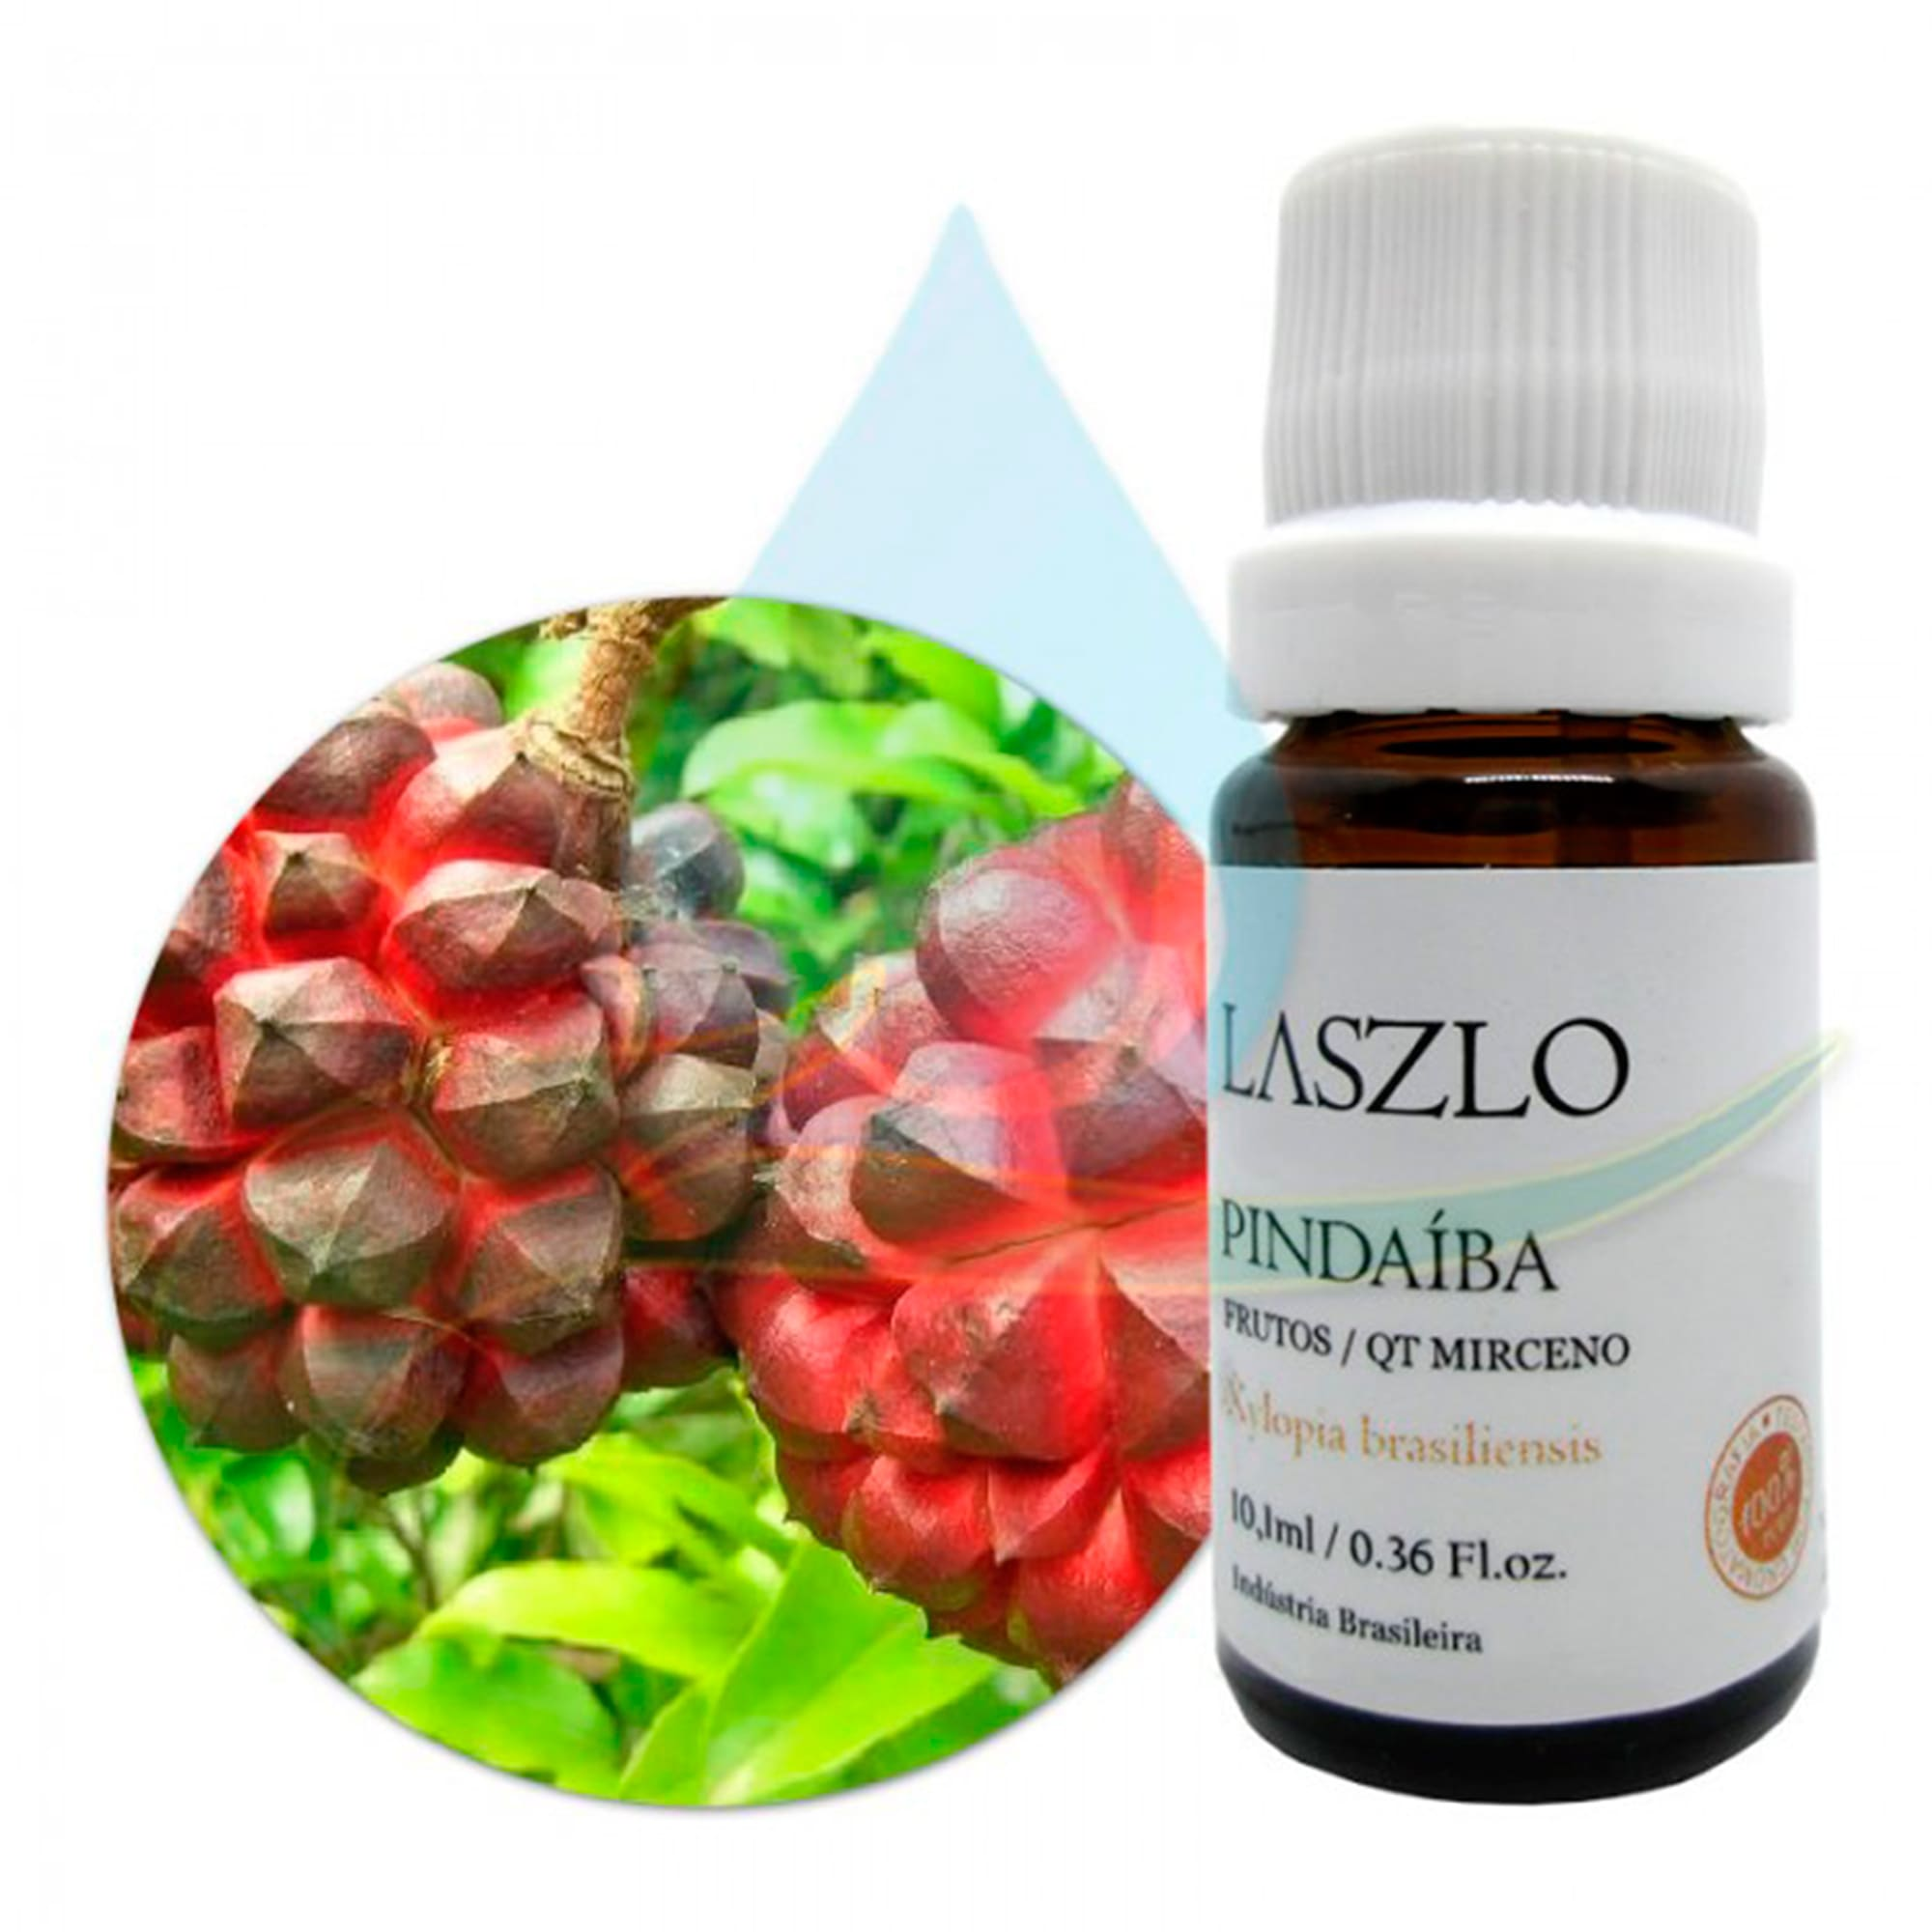 Óleo Essencial de Pindaíba (Frutos) 10,1ml - Laszlo